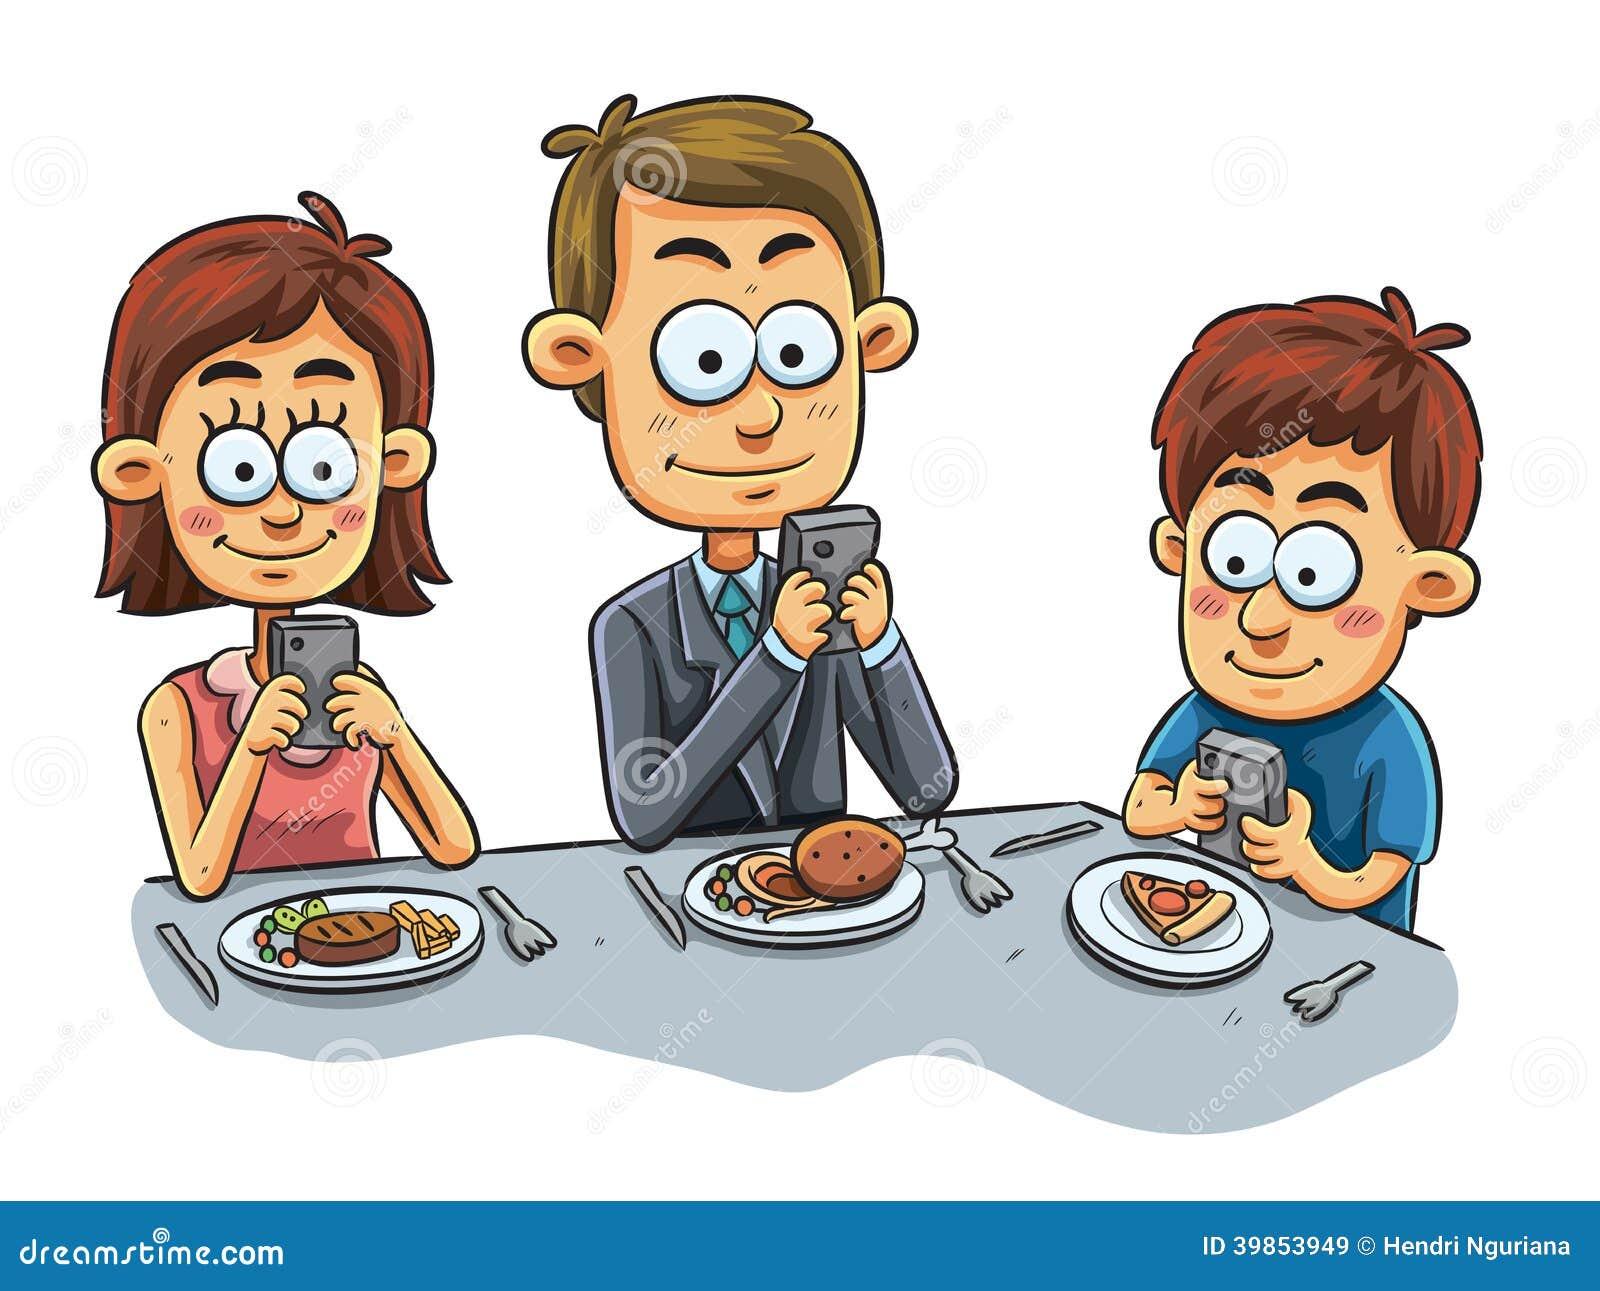 clipart family dinner table - photo #21